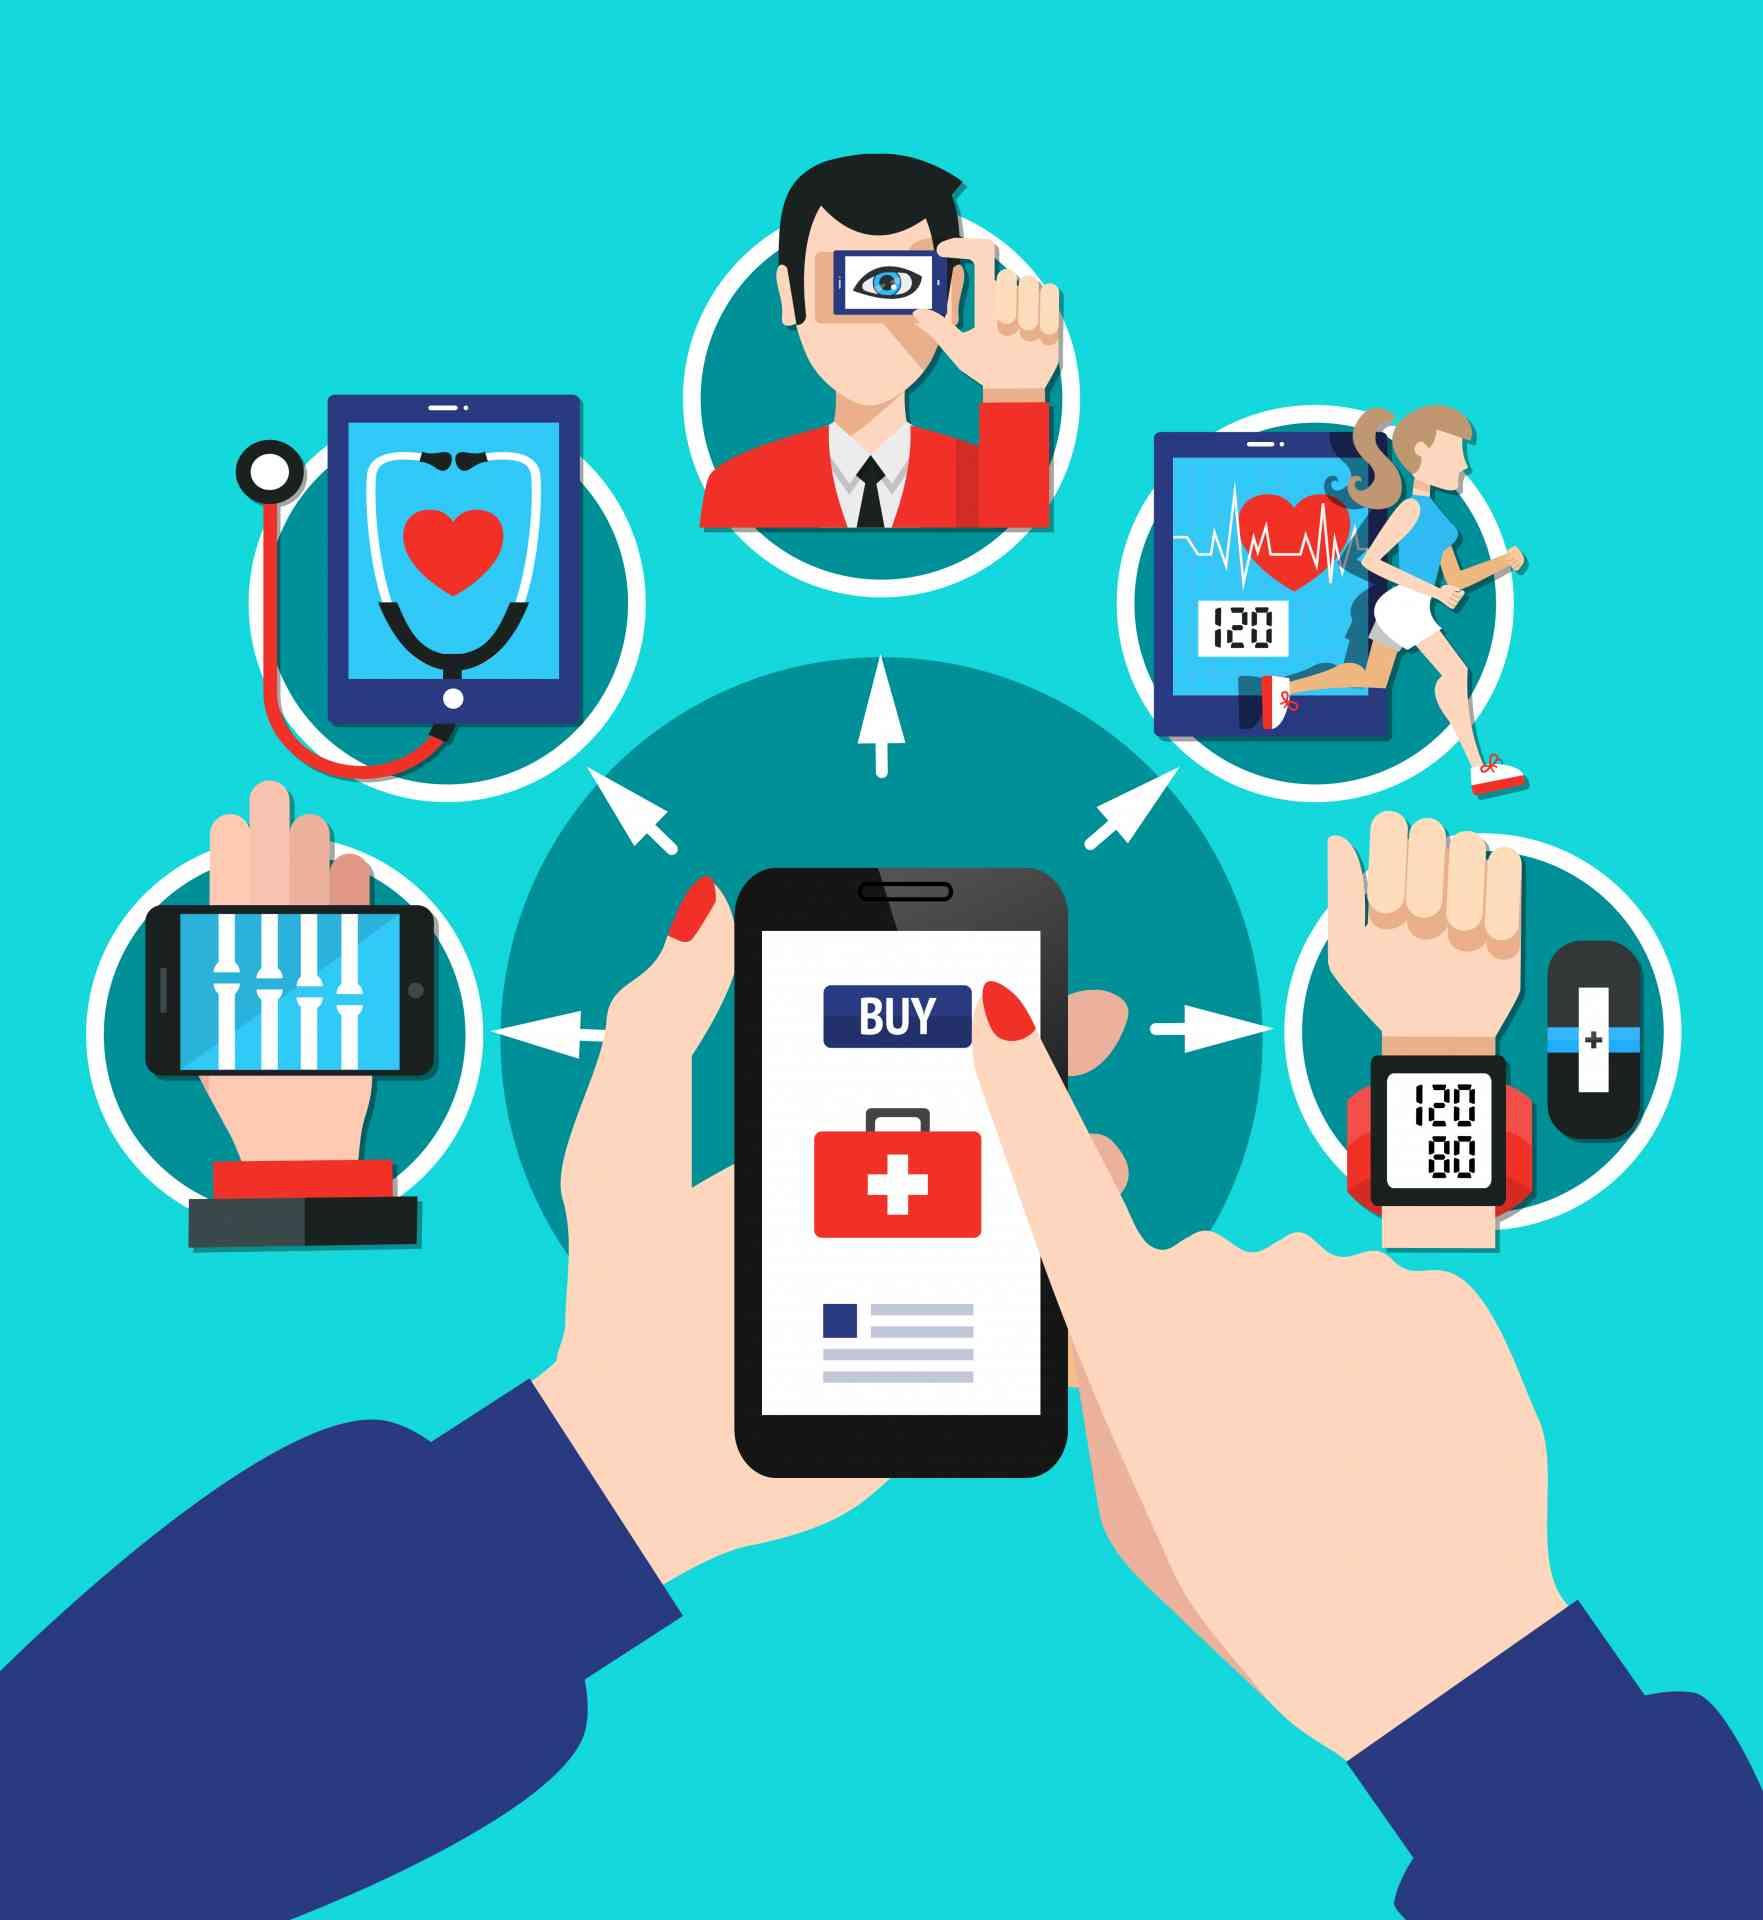 Digital healthcare gadgets tools software with index finger choosing smartphone screen menu options flat poster vector illustration